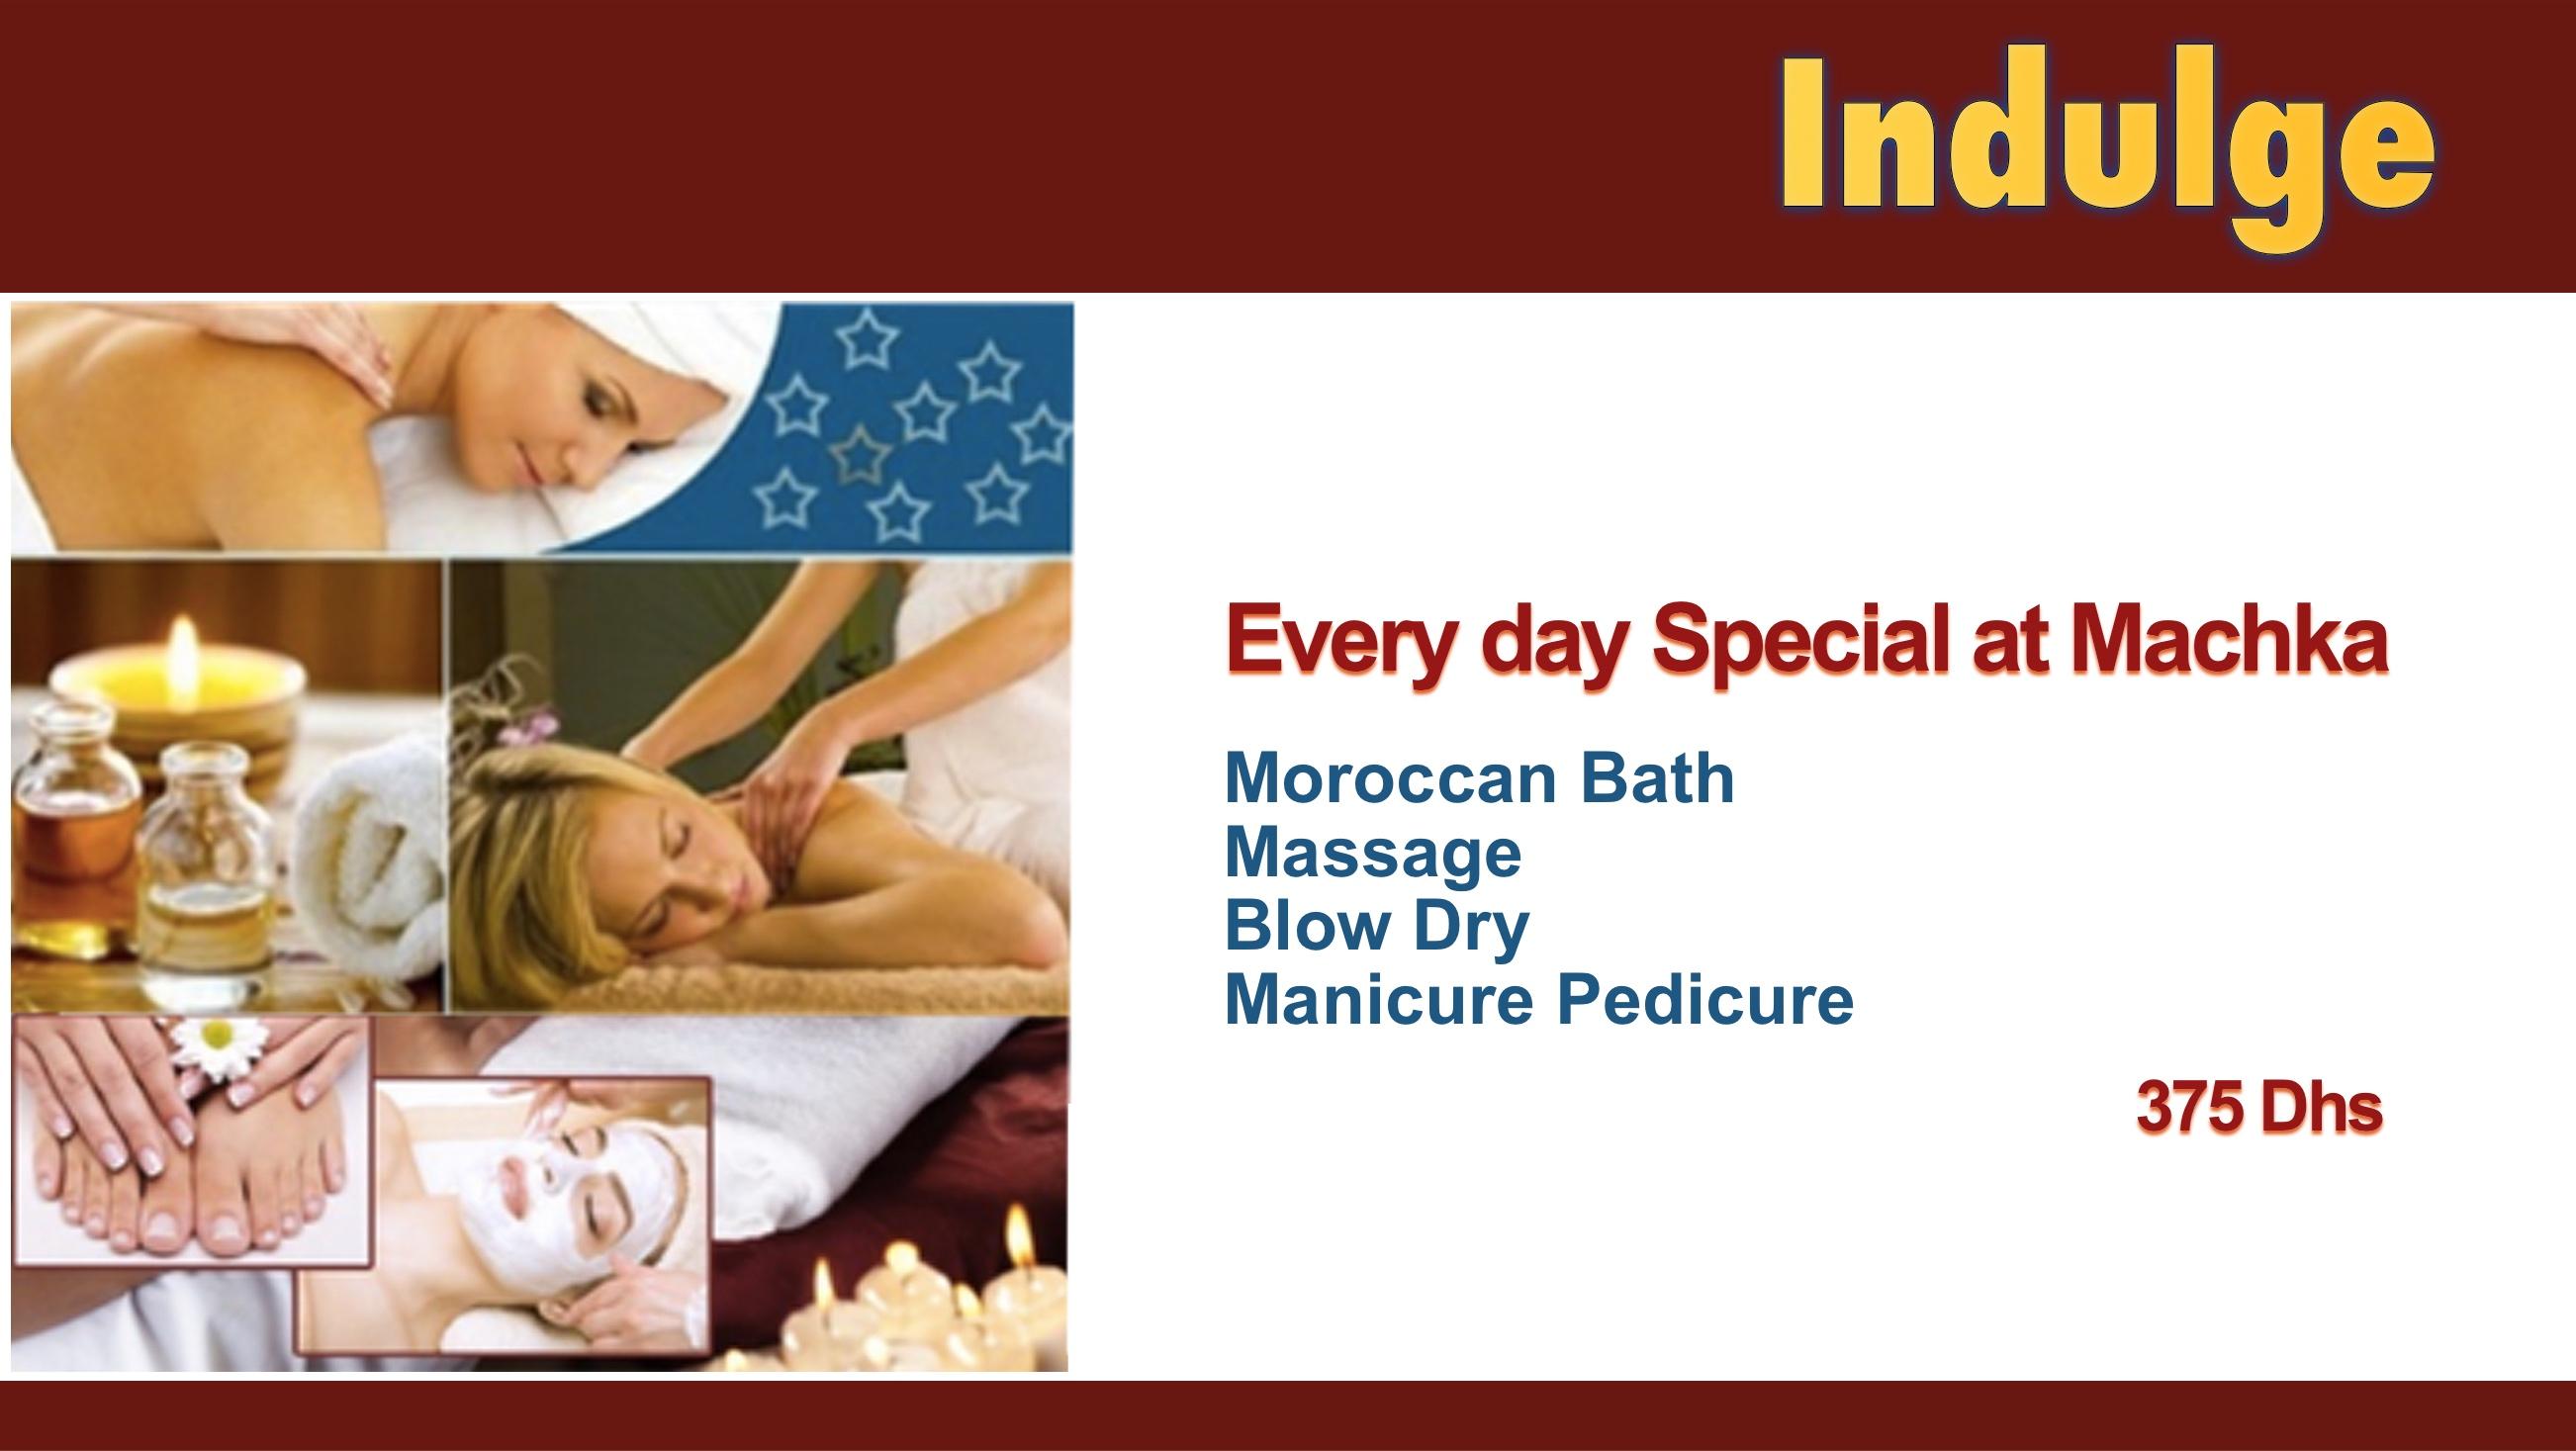 Moroccan bath promotion Dubai